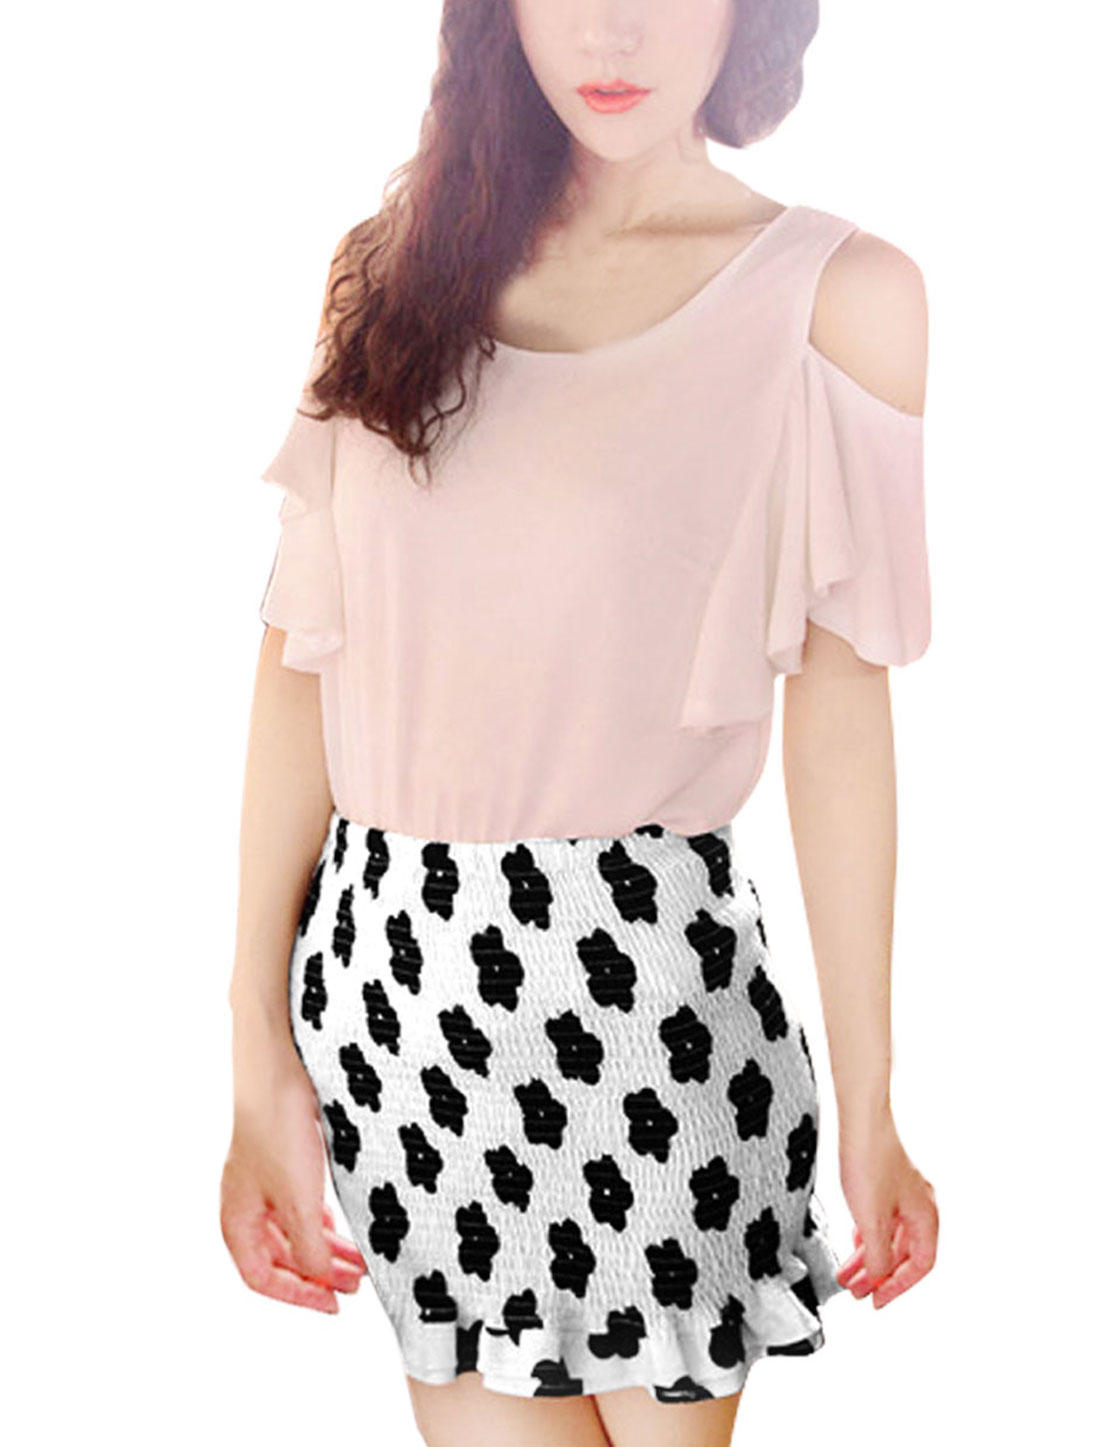 Lady Elasitc Waist Flower Prints Close-fit White Mini Skirt XS